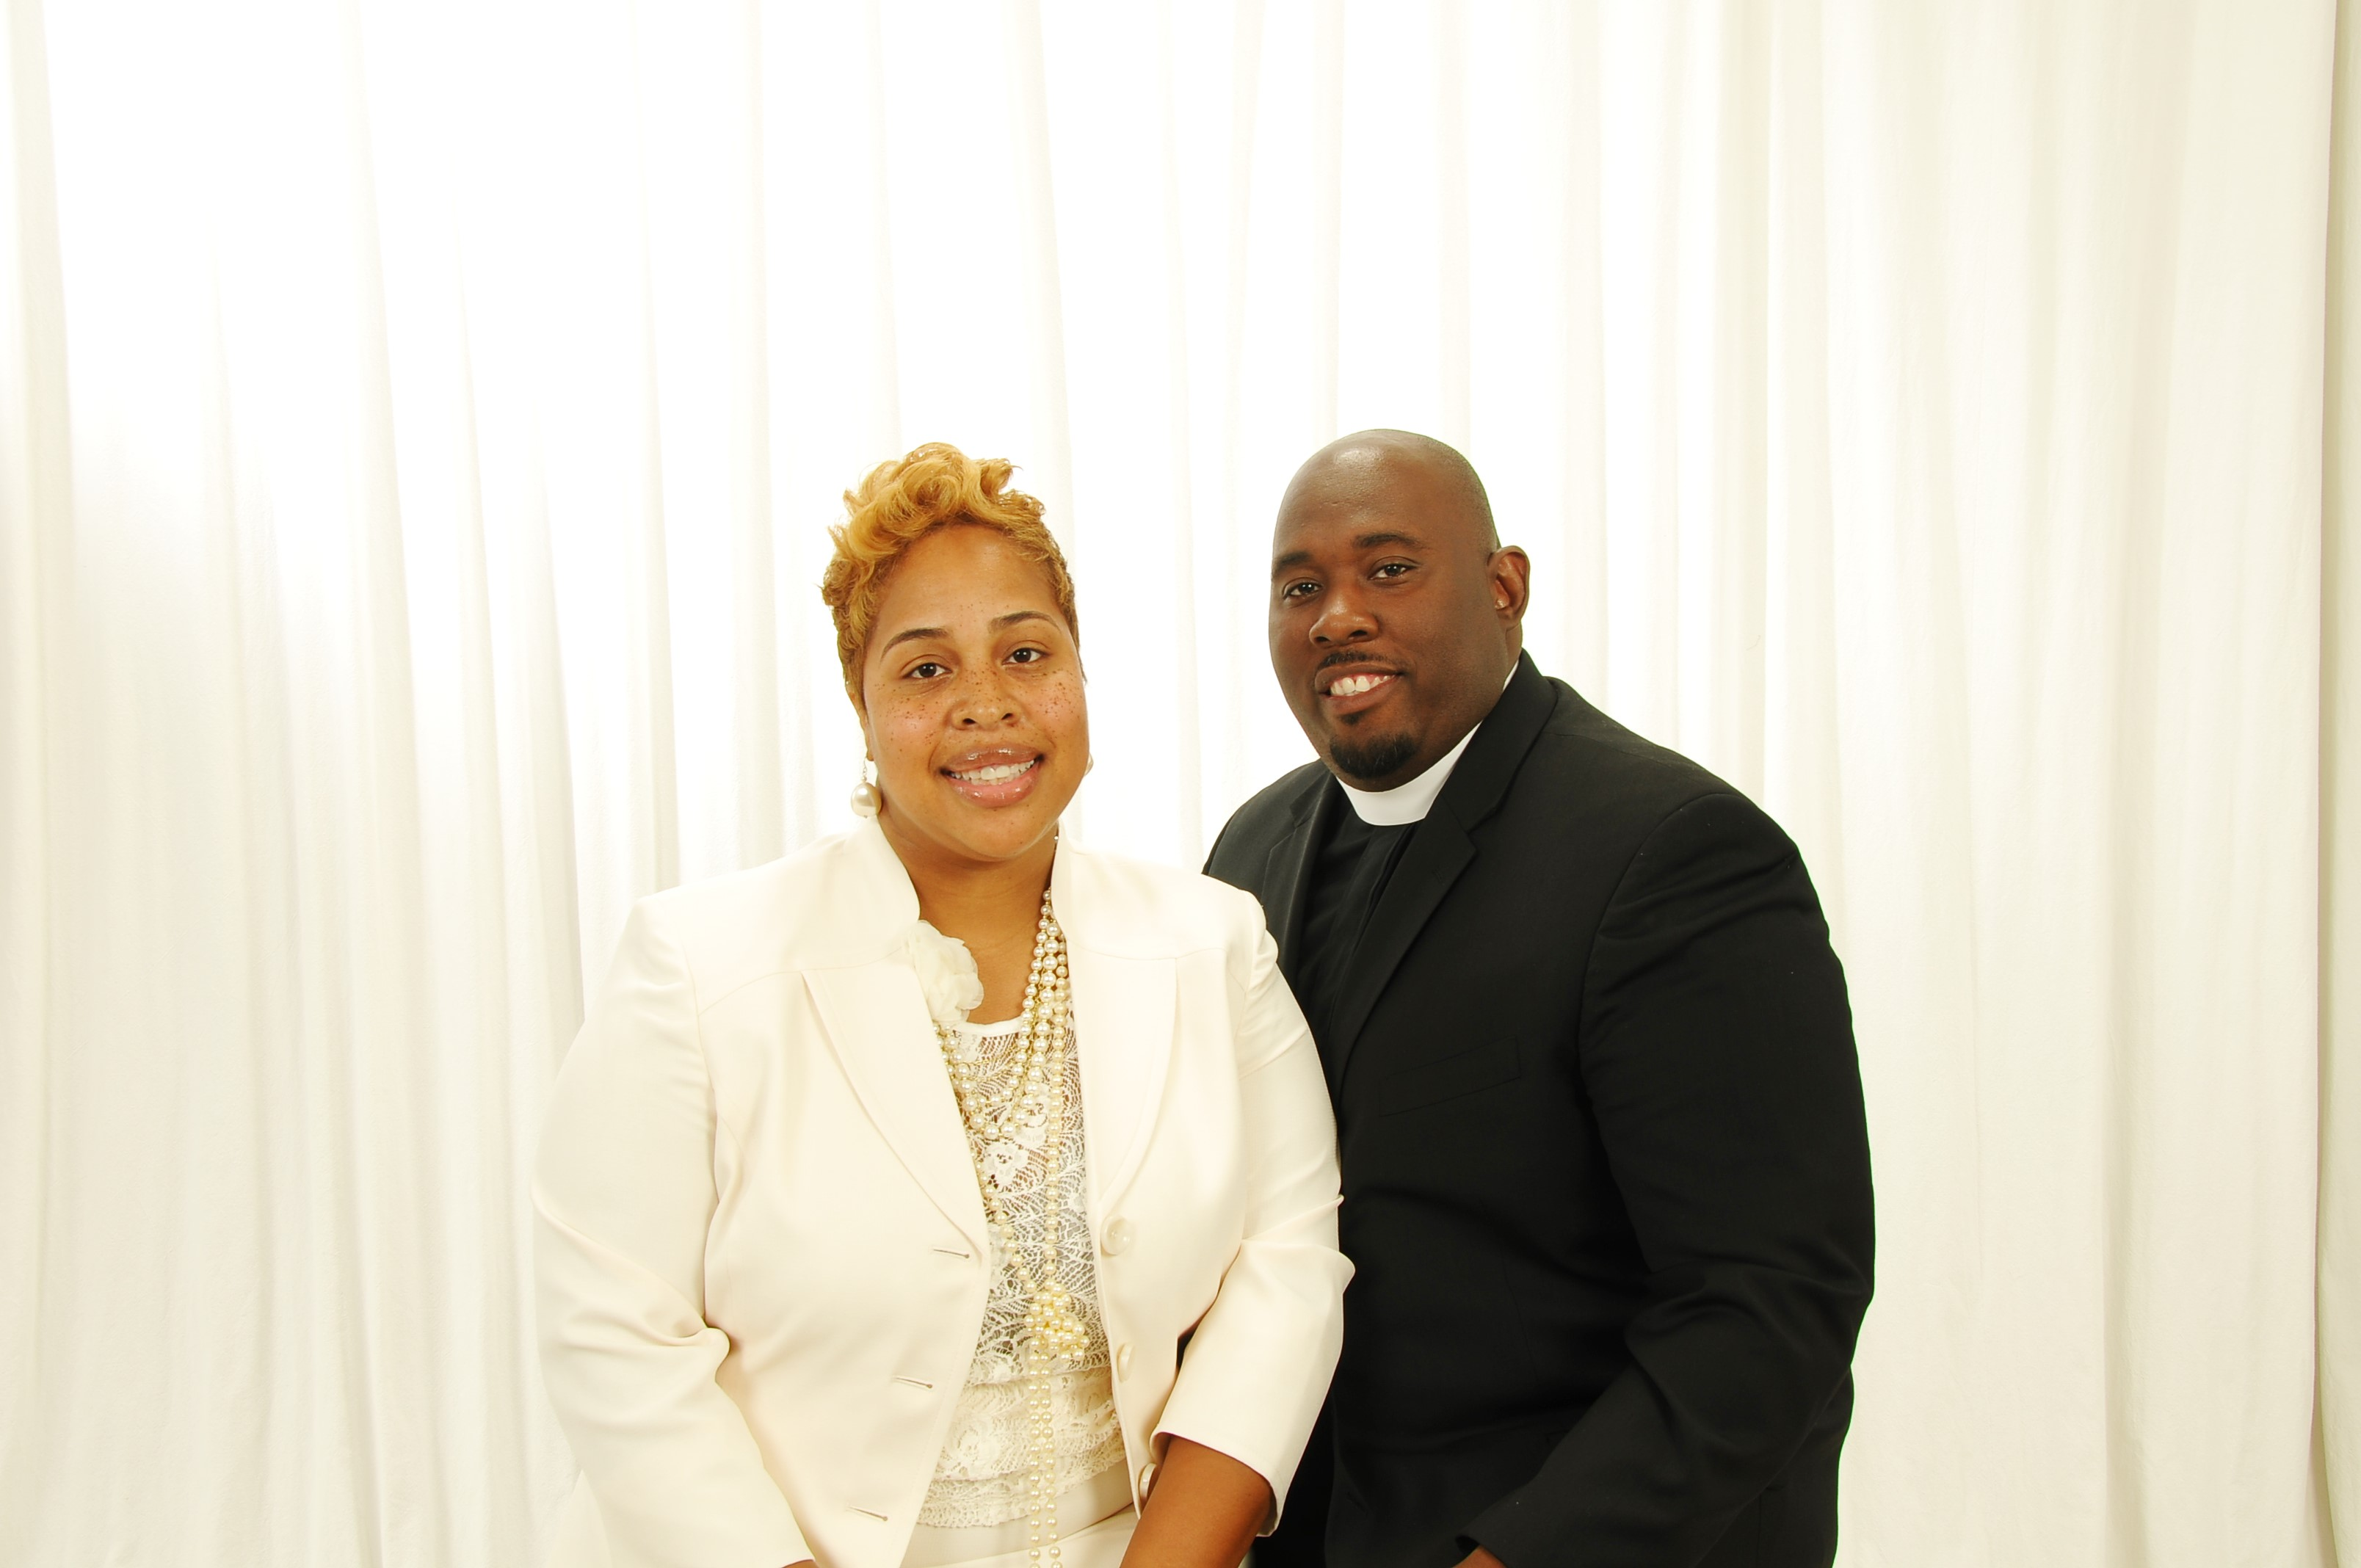 Pastor and Evangelist Nickerson